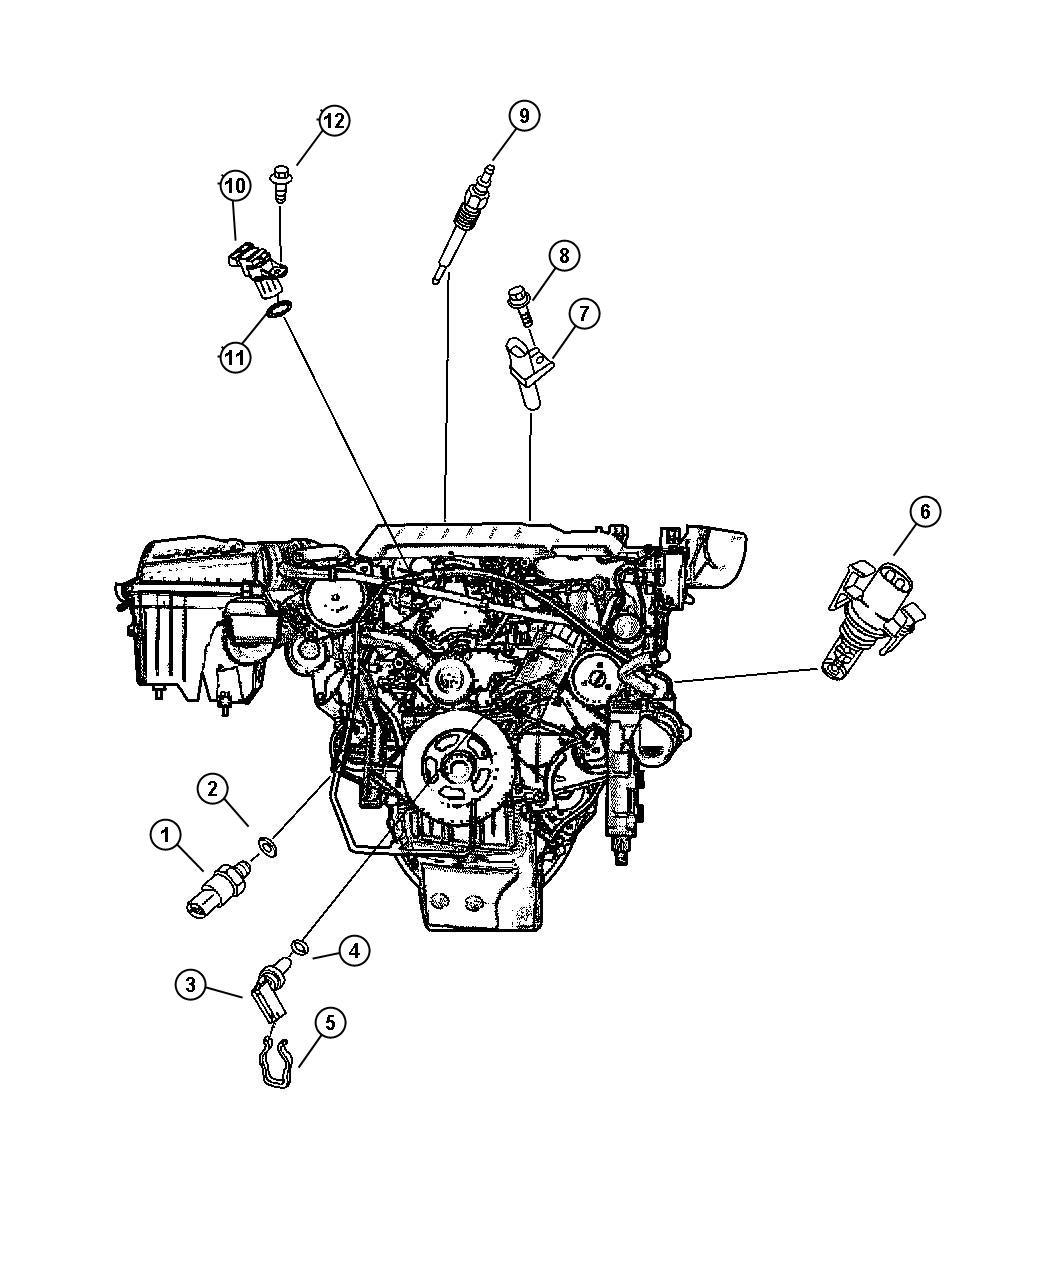 Chrysler Crossfire Sending unit, sensor. Temperature